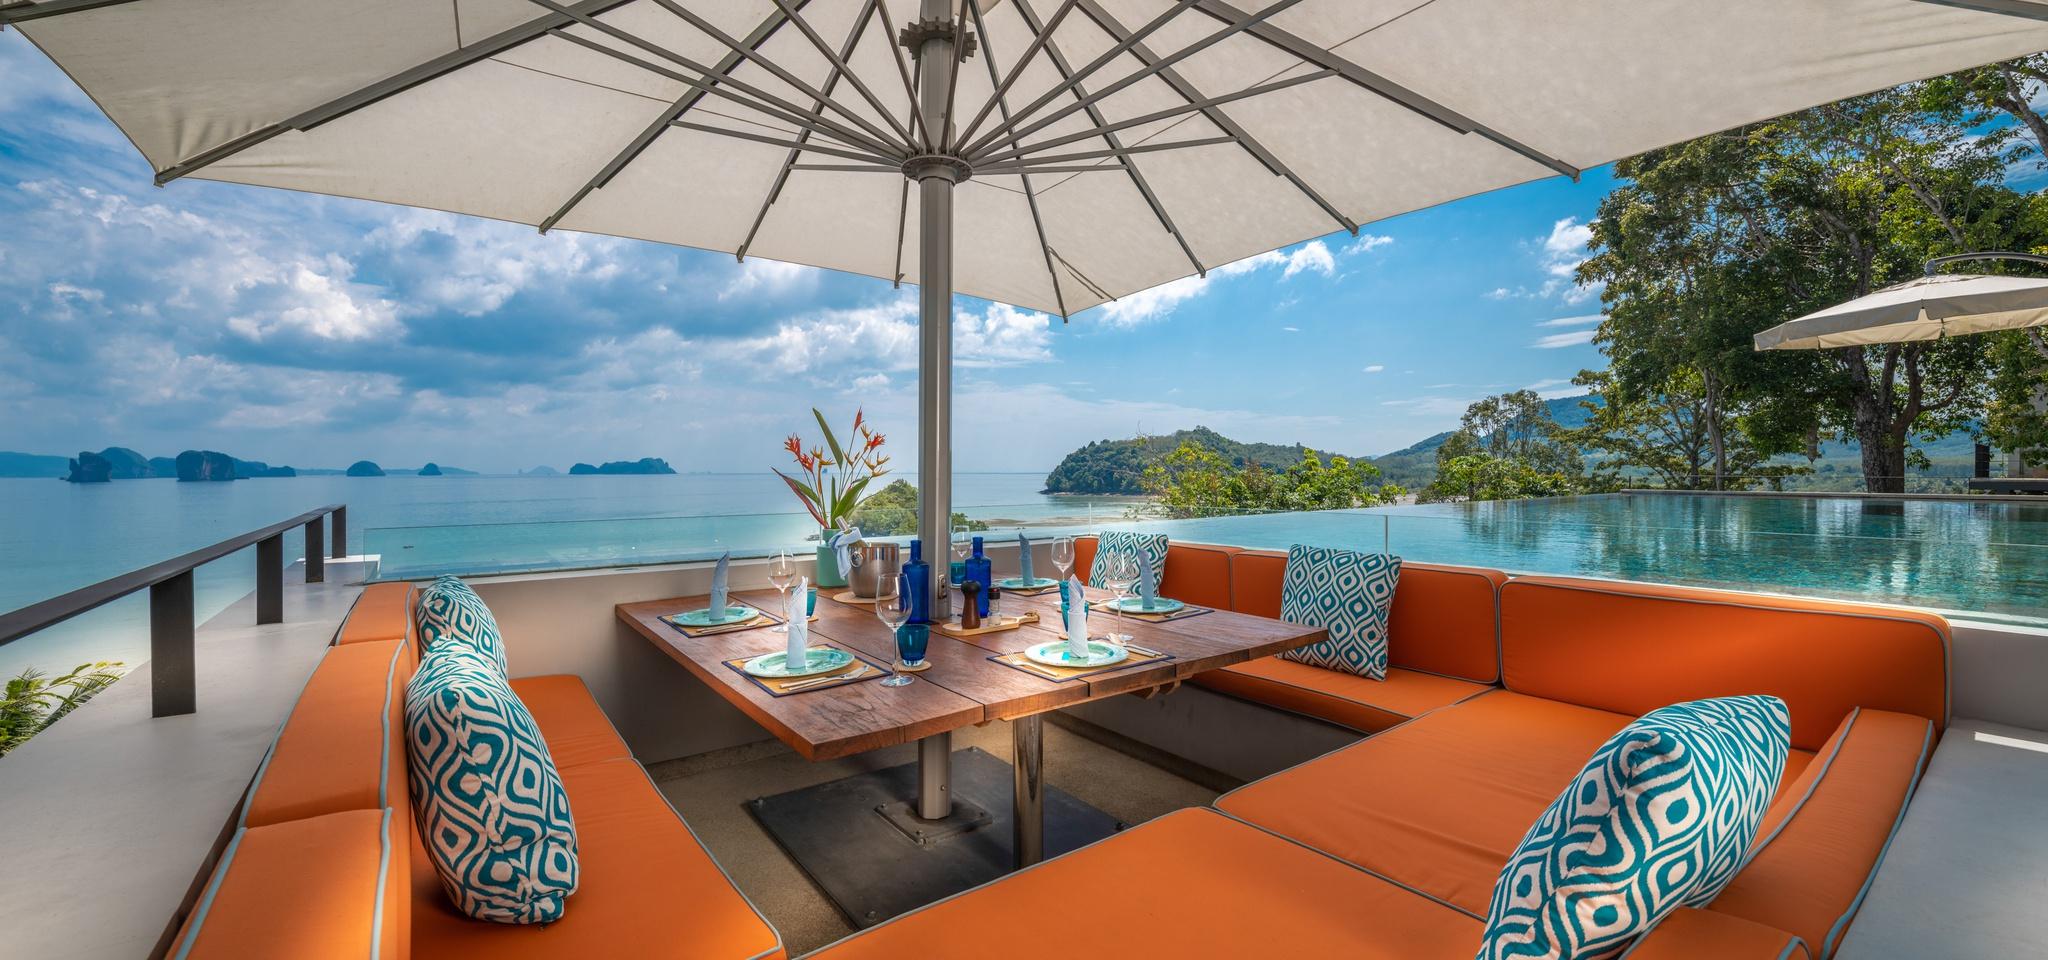 poolside lounge in luxury villas in thailand